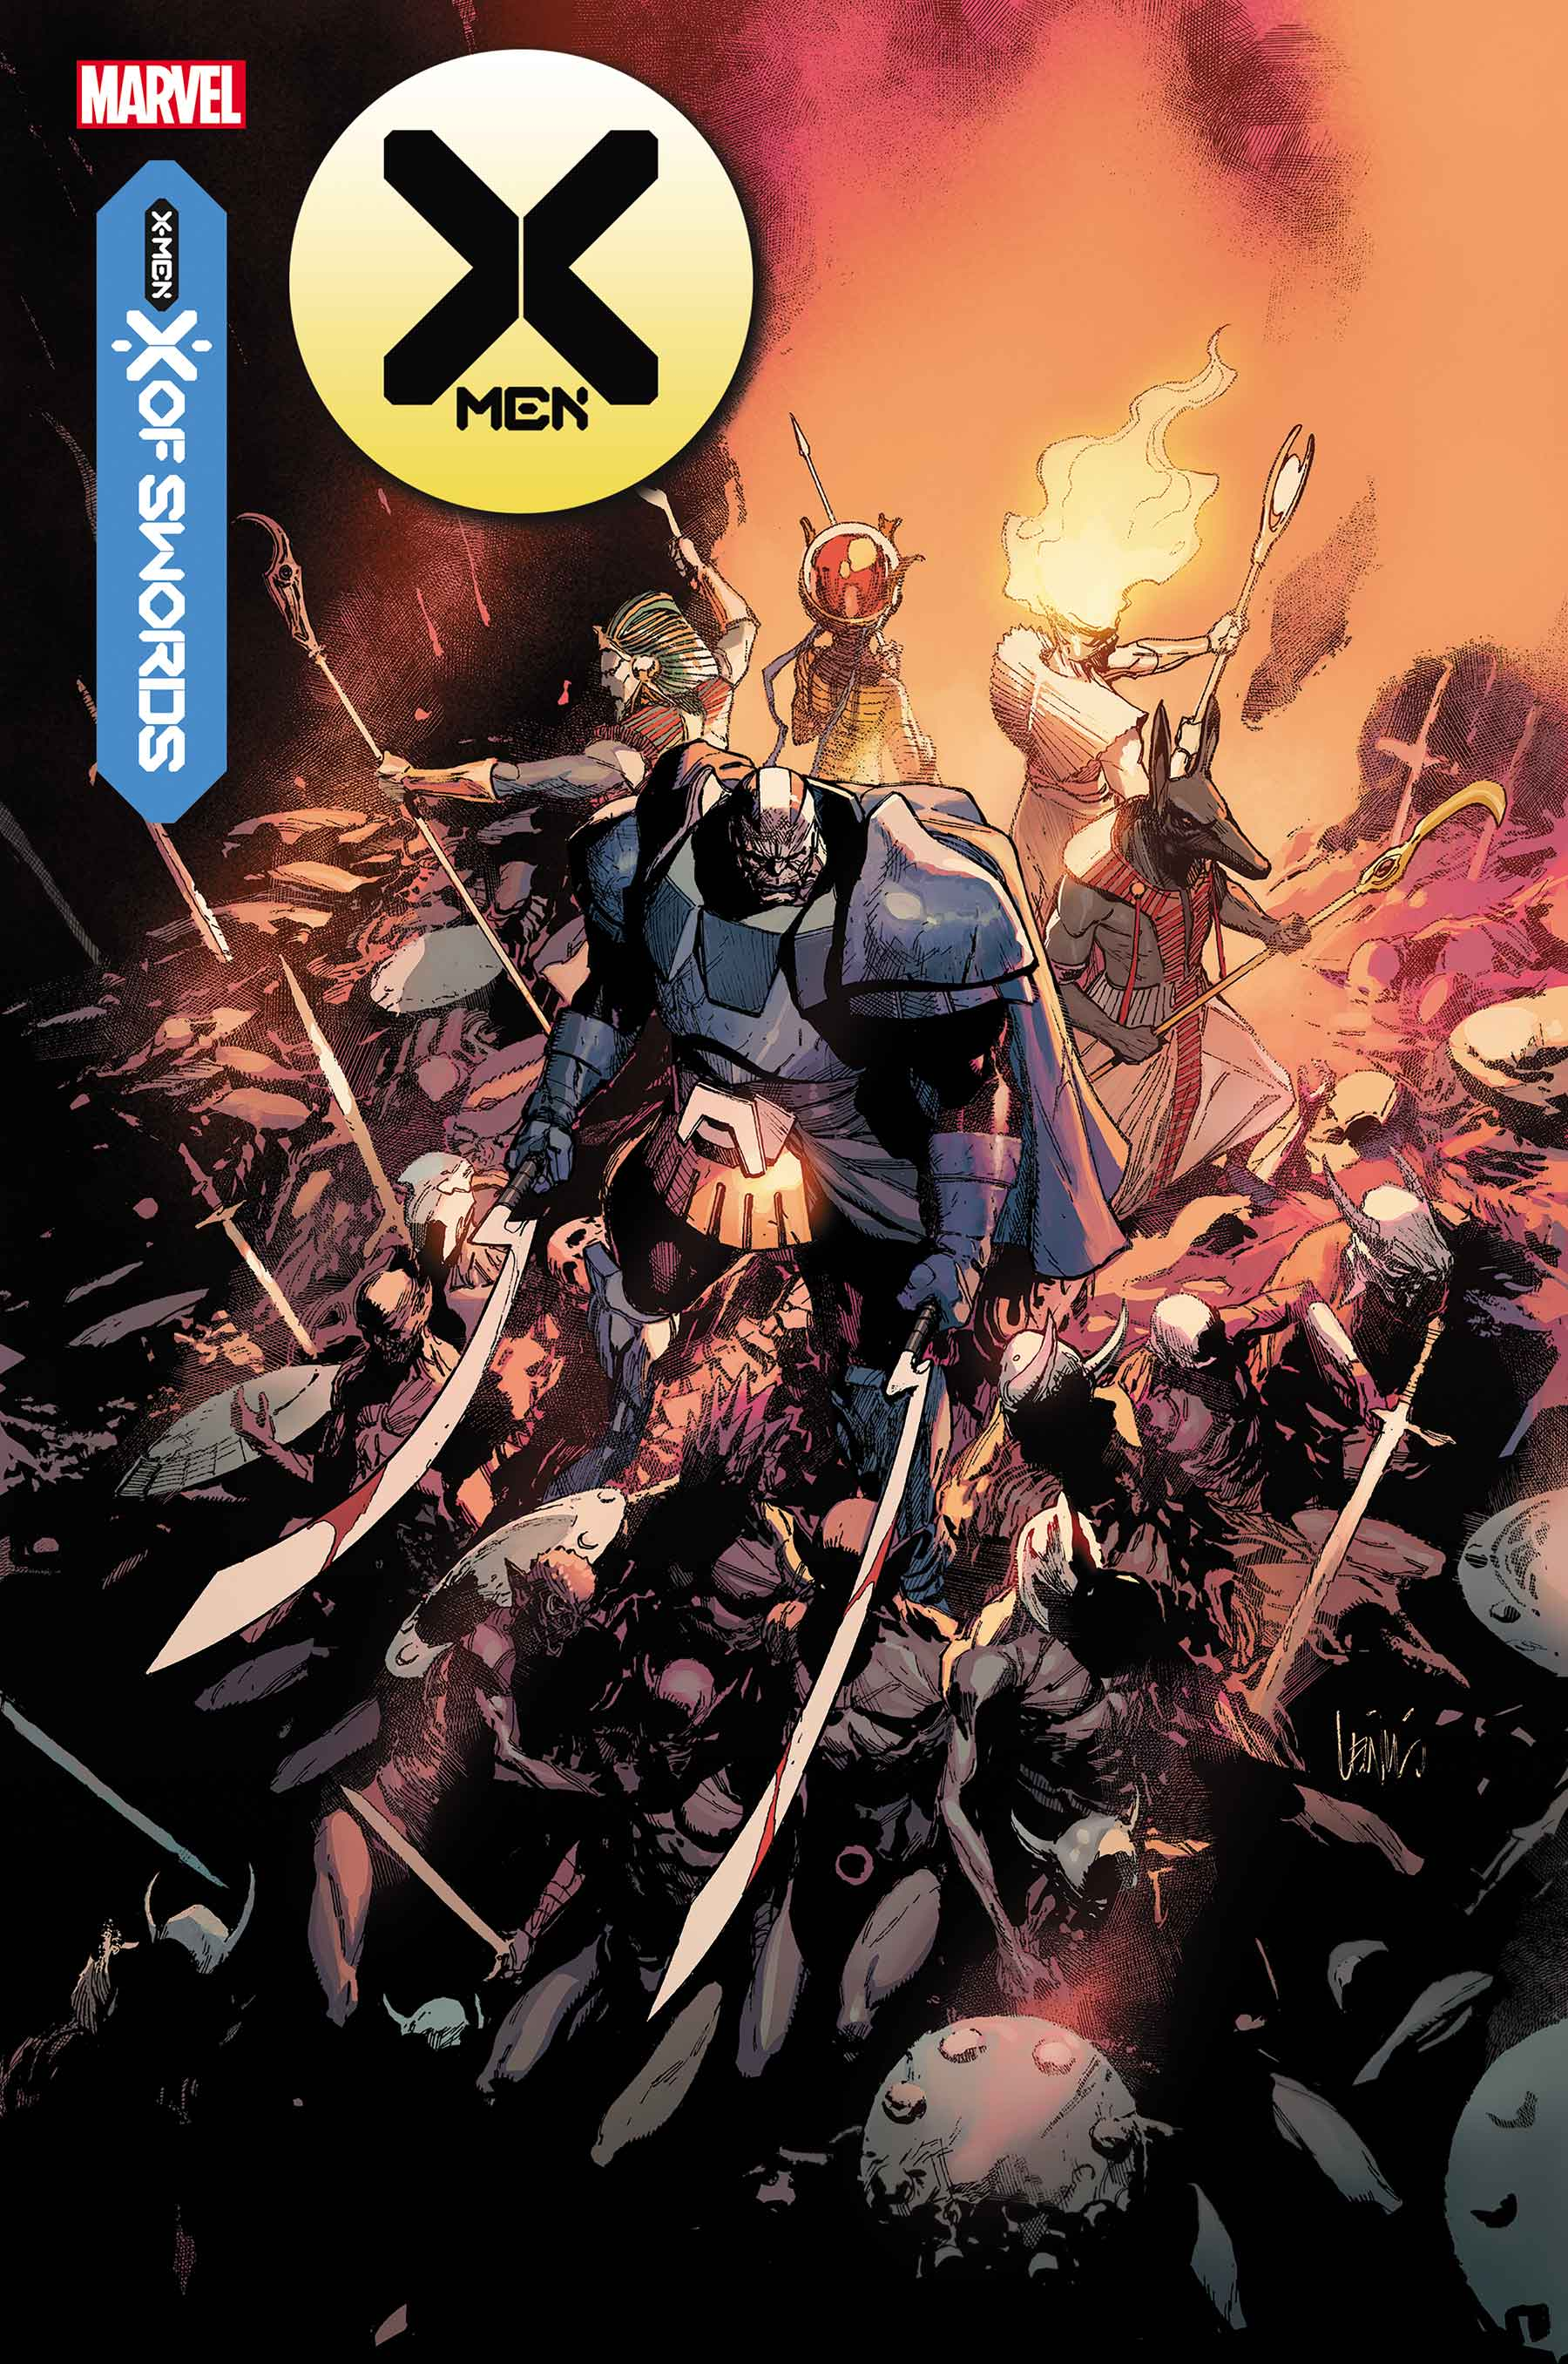 X-Men (2019) #13